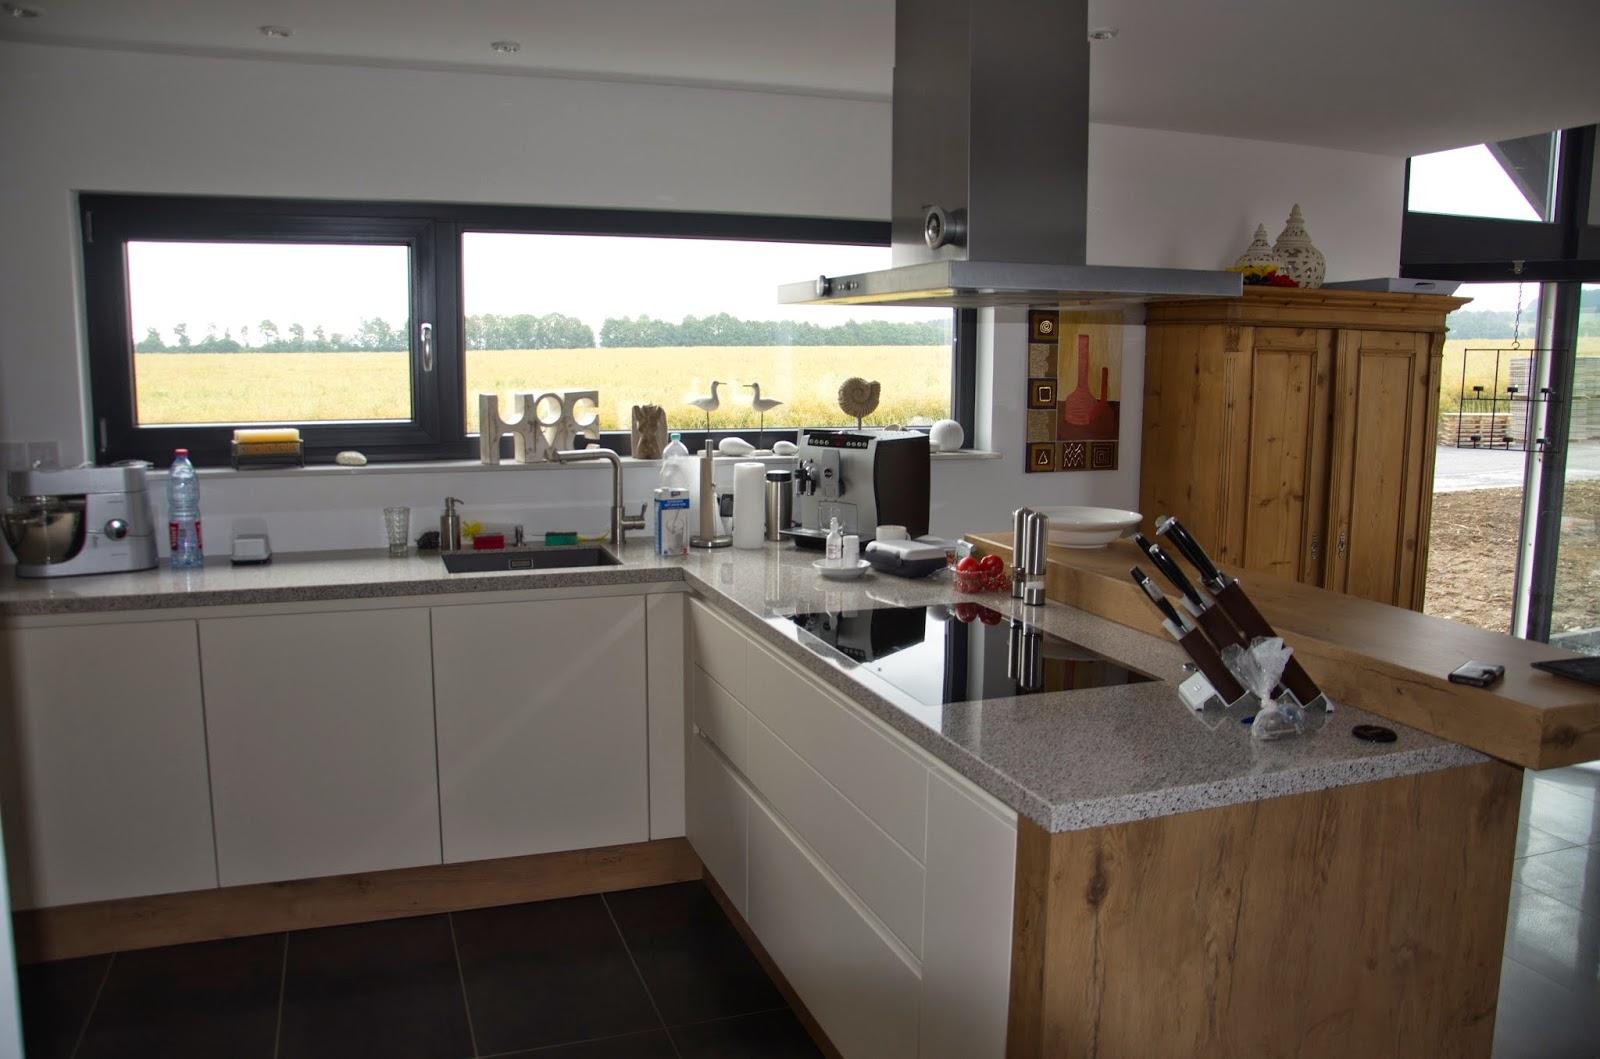 maison du monde küche